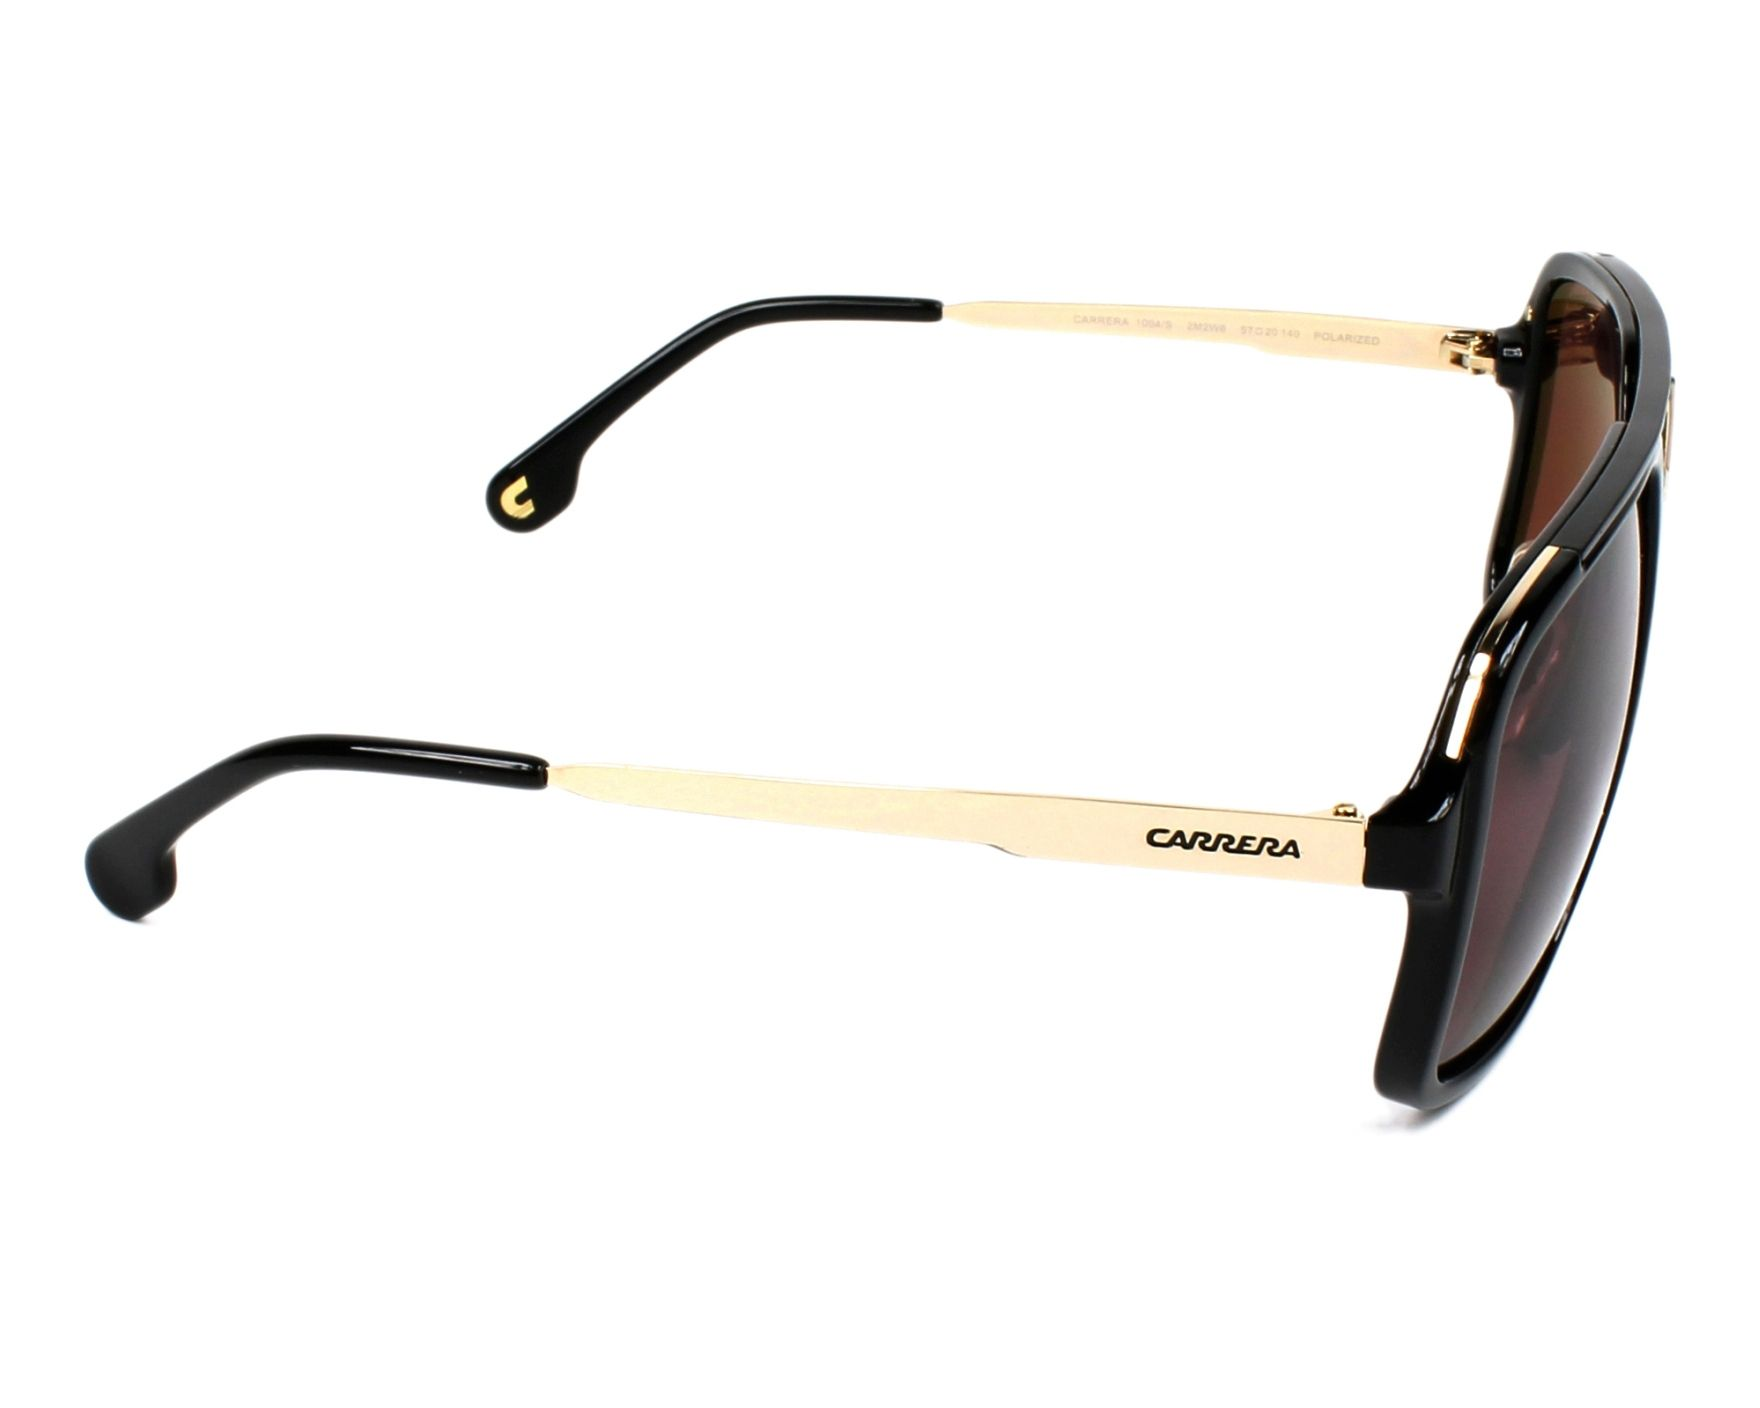 0d2fd6caa0c Sunglasses Carrera 1004-S 2M2 W6 57-20 Black Gold side view